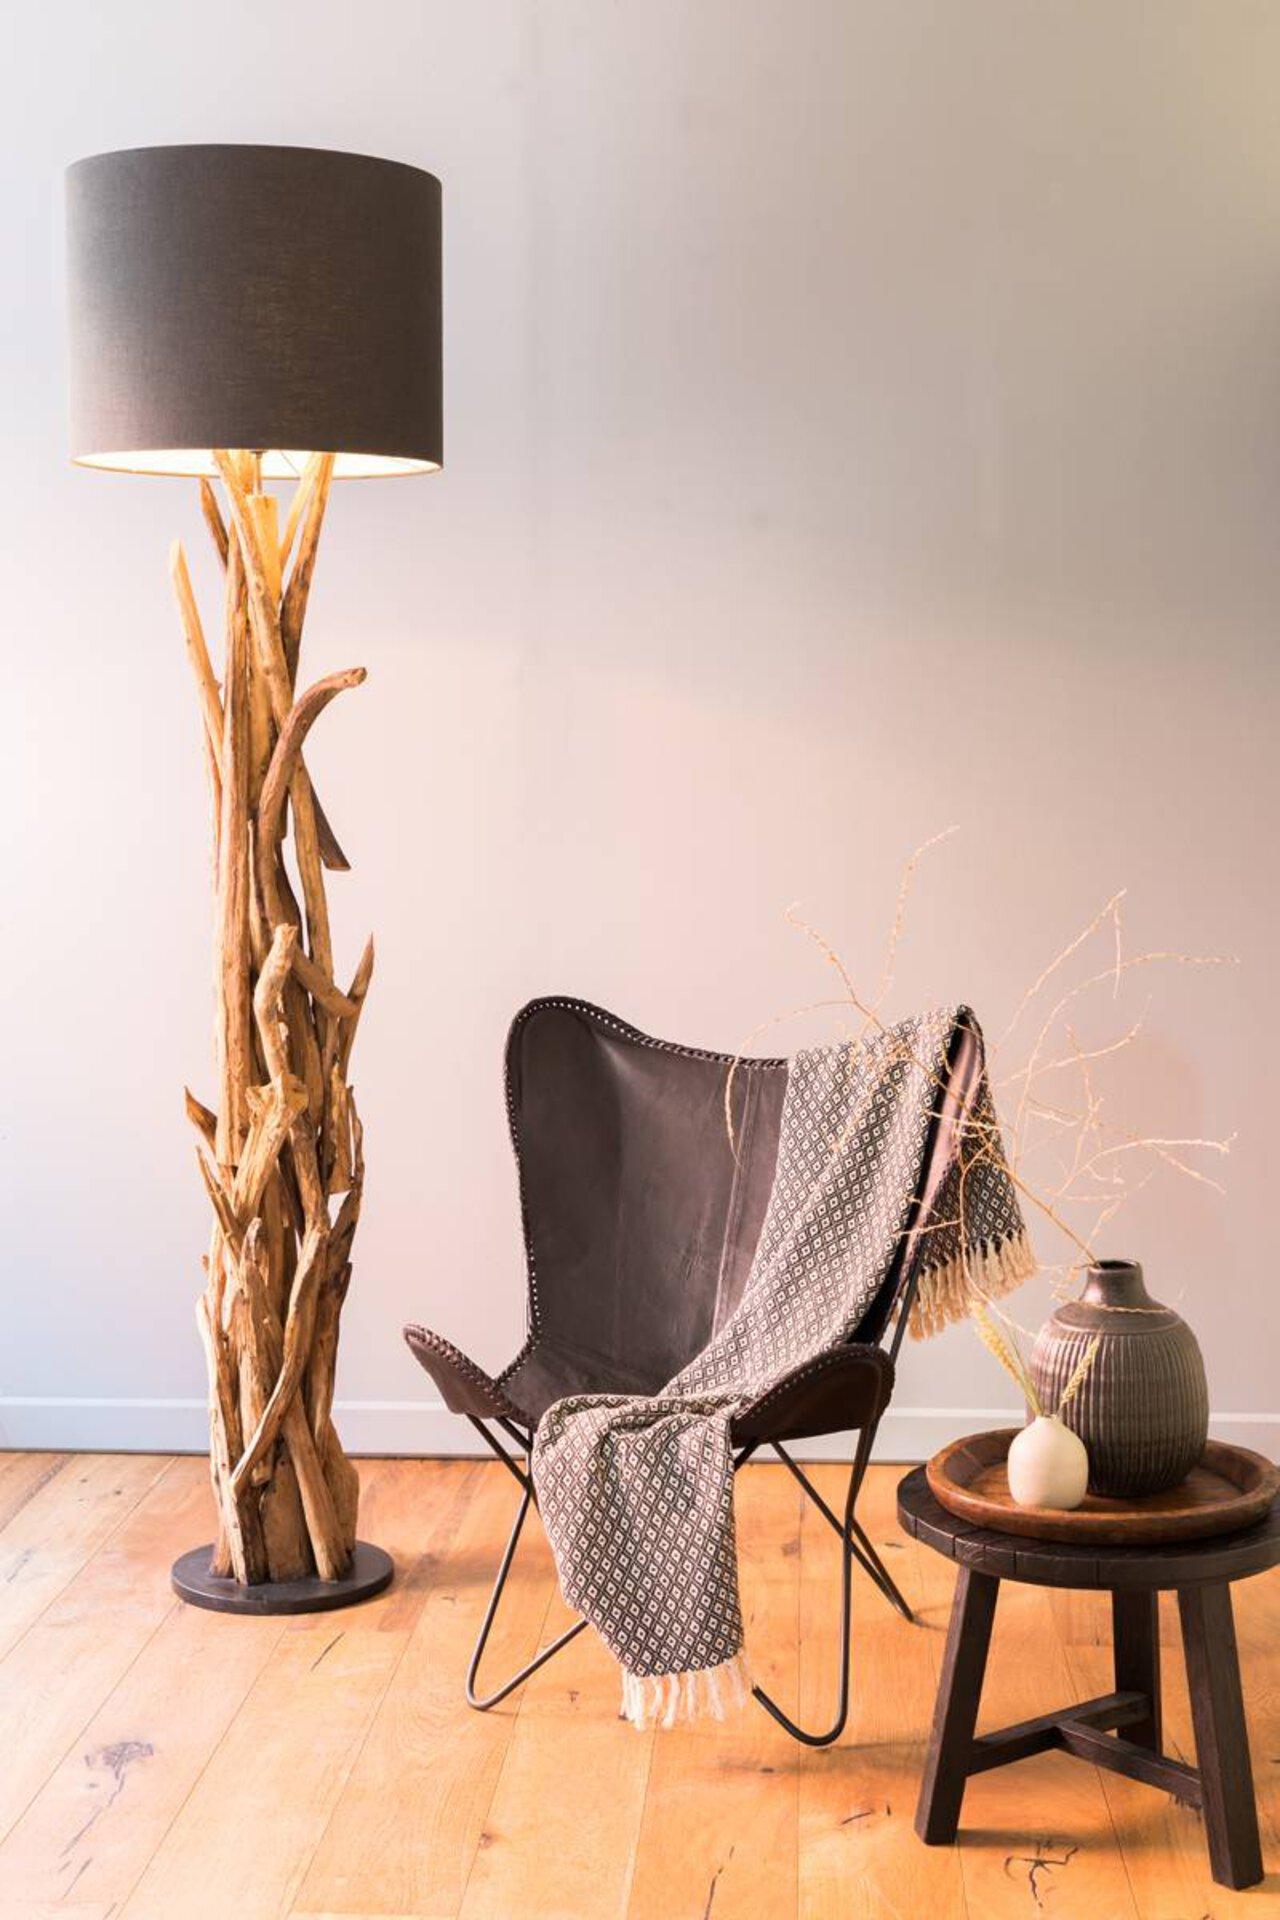 Stehleuchte VIDIN Light & Living Metall braun 35 x 182 x 35 cm